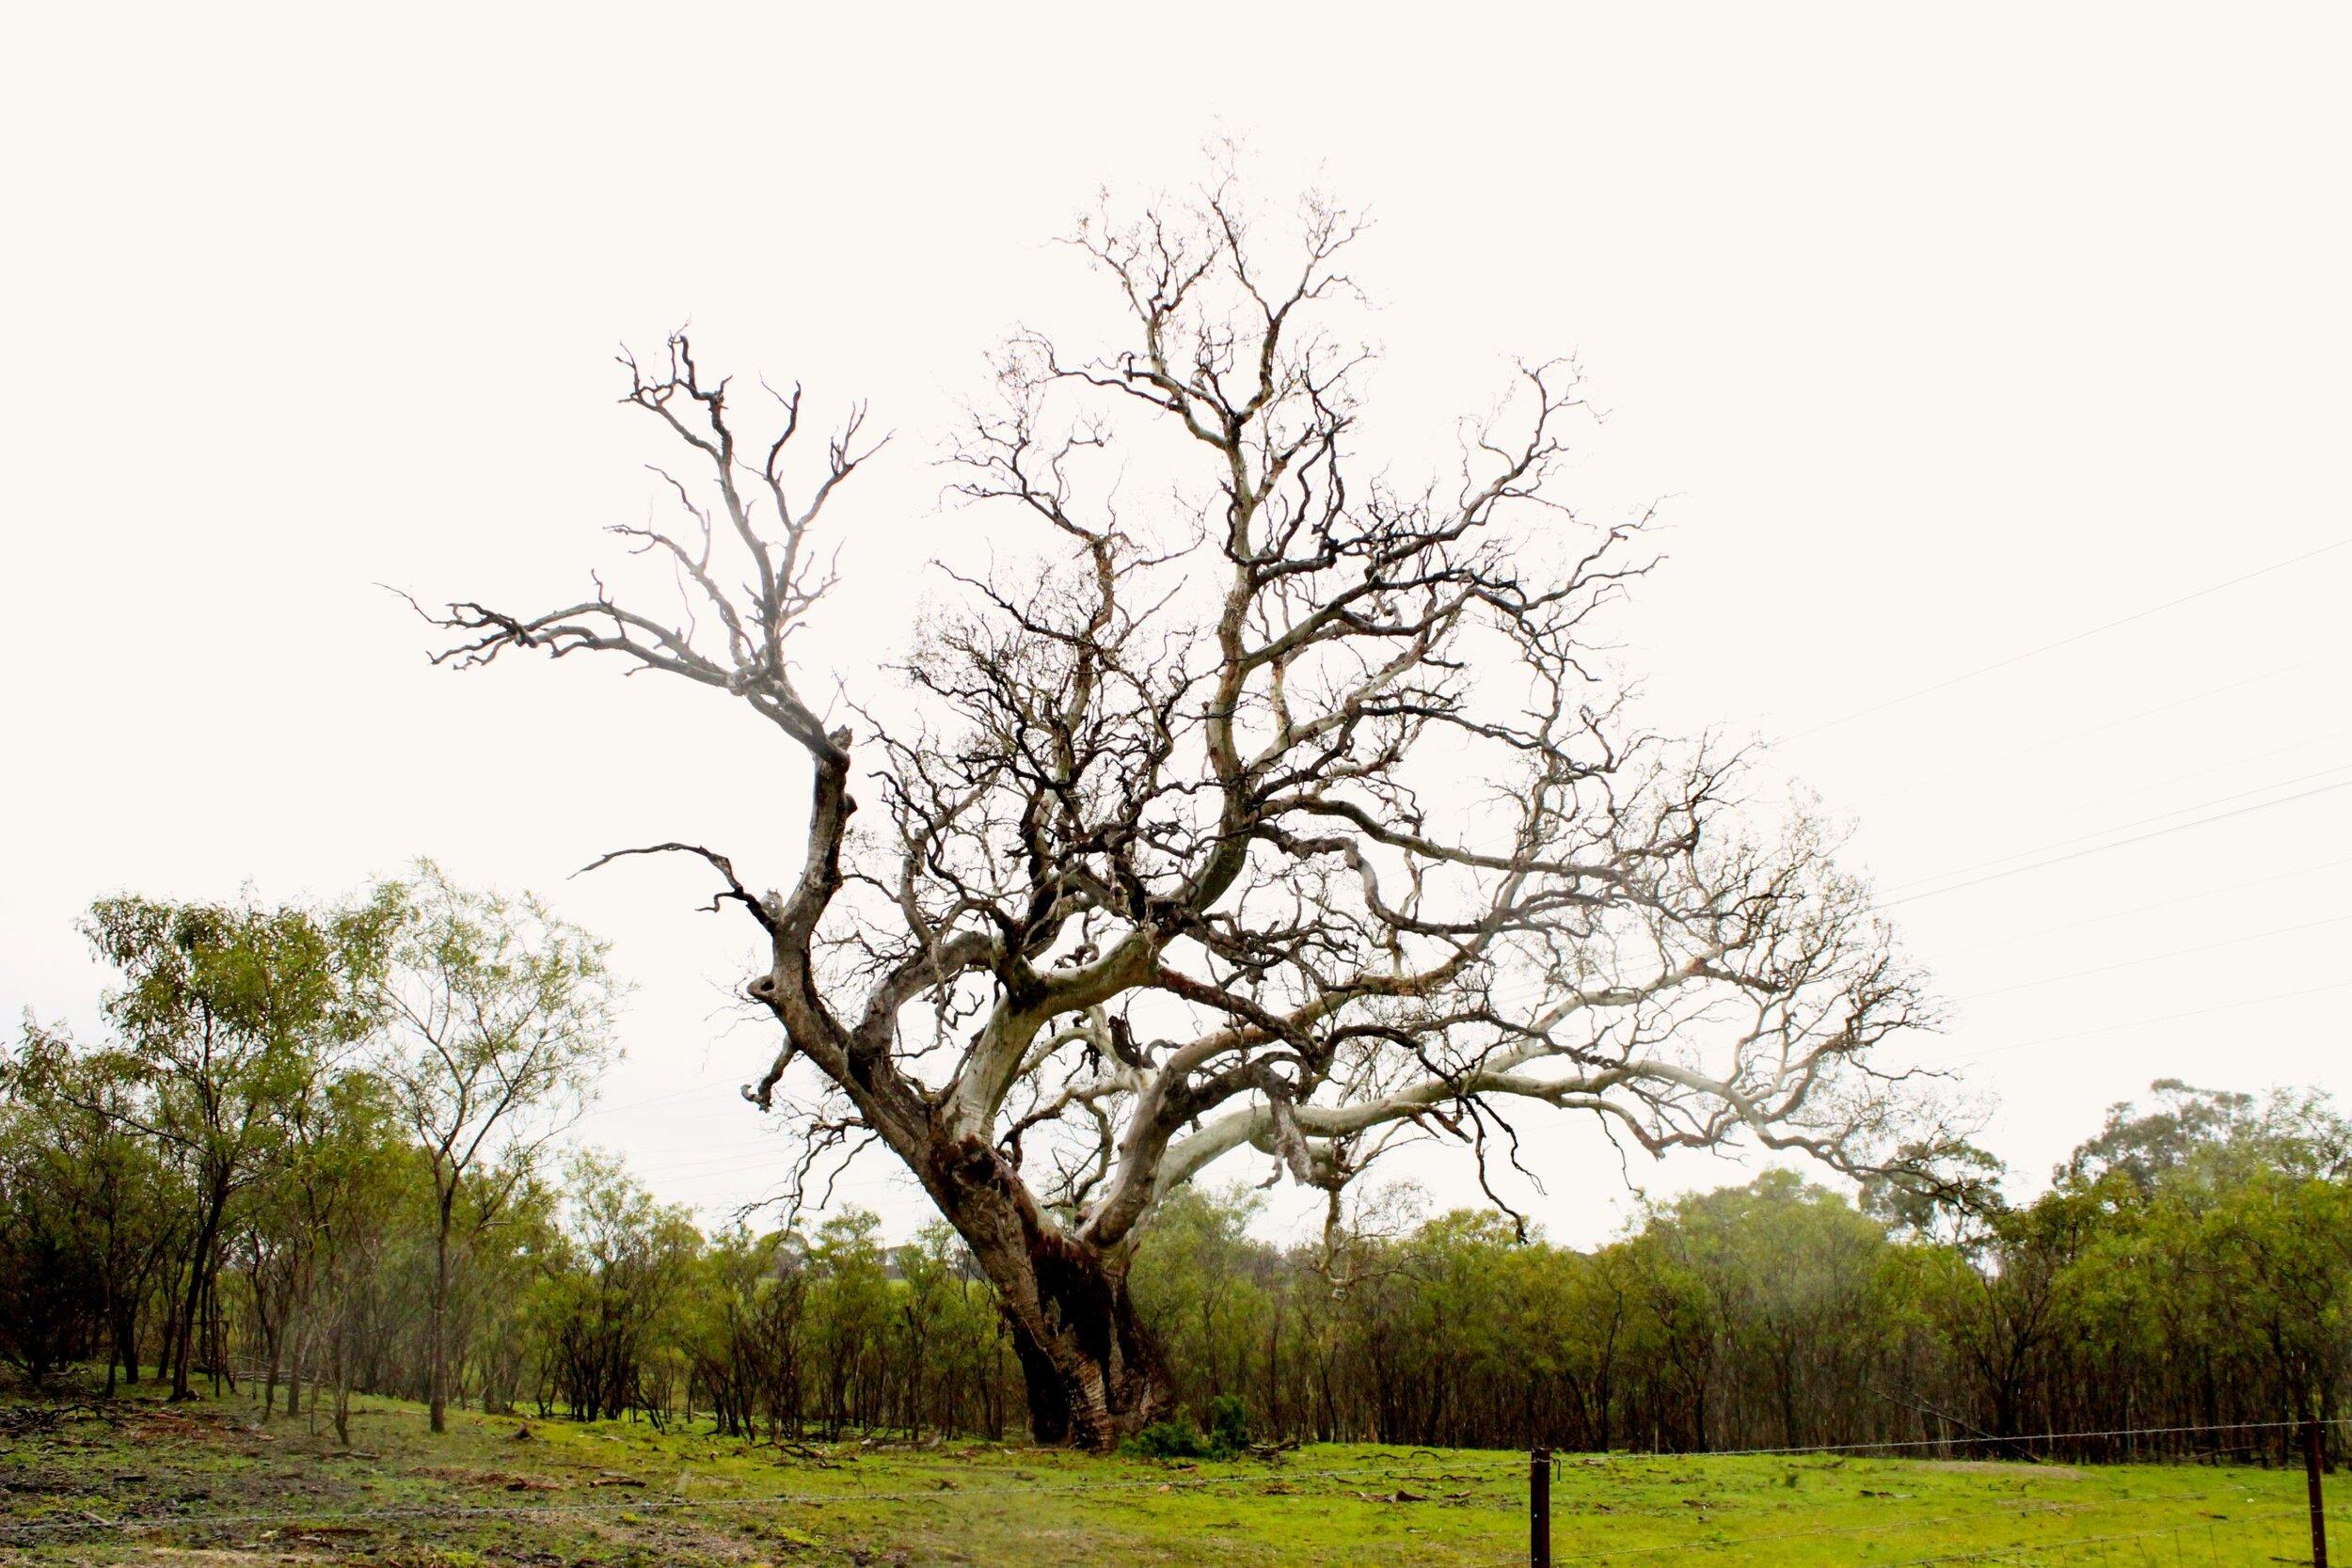 A dead 300 year old river gum tree near the Lascelles Dam.